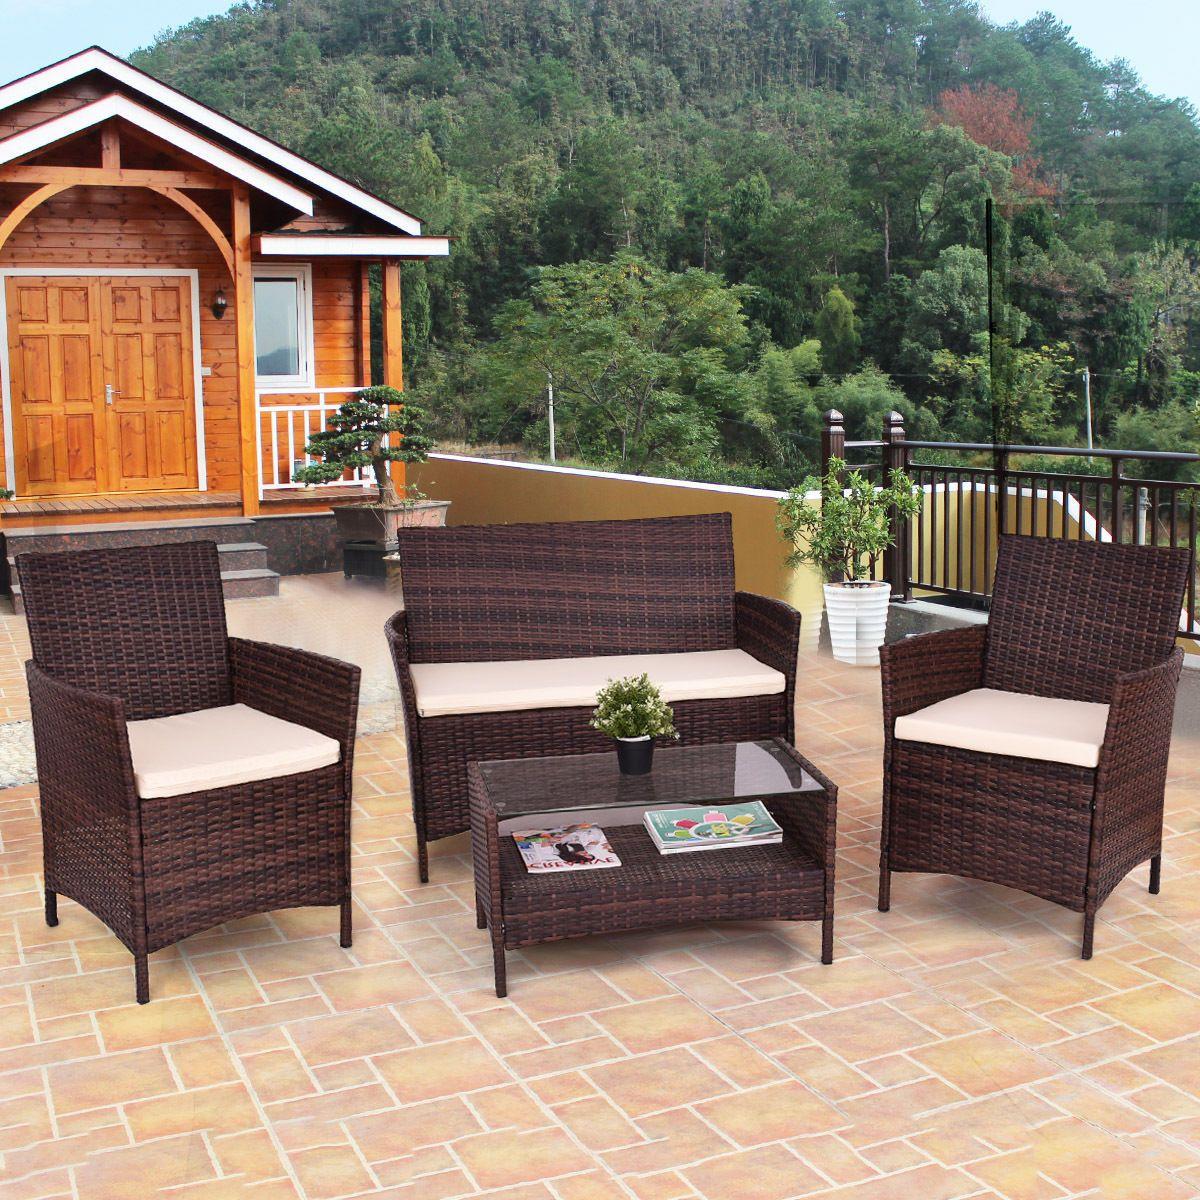 Giantex 4 stücke Terrasse PE Rattan Wicker Kaffee Tisch Regal Moderne Garten Sofa Möbel Set Mit Kissen HW54898